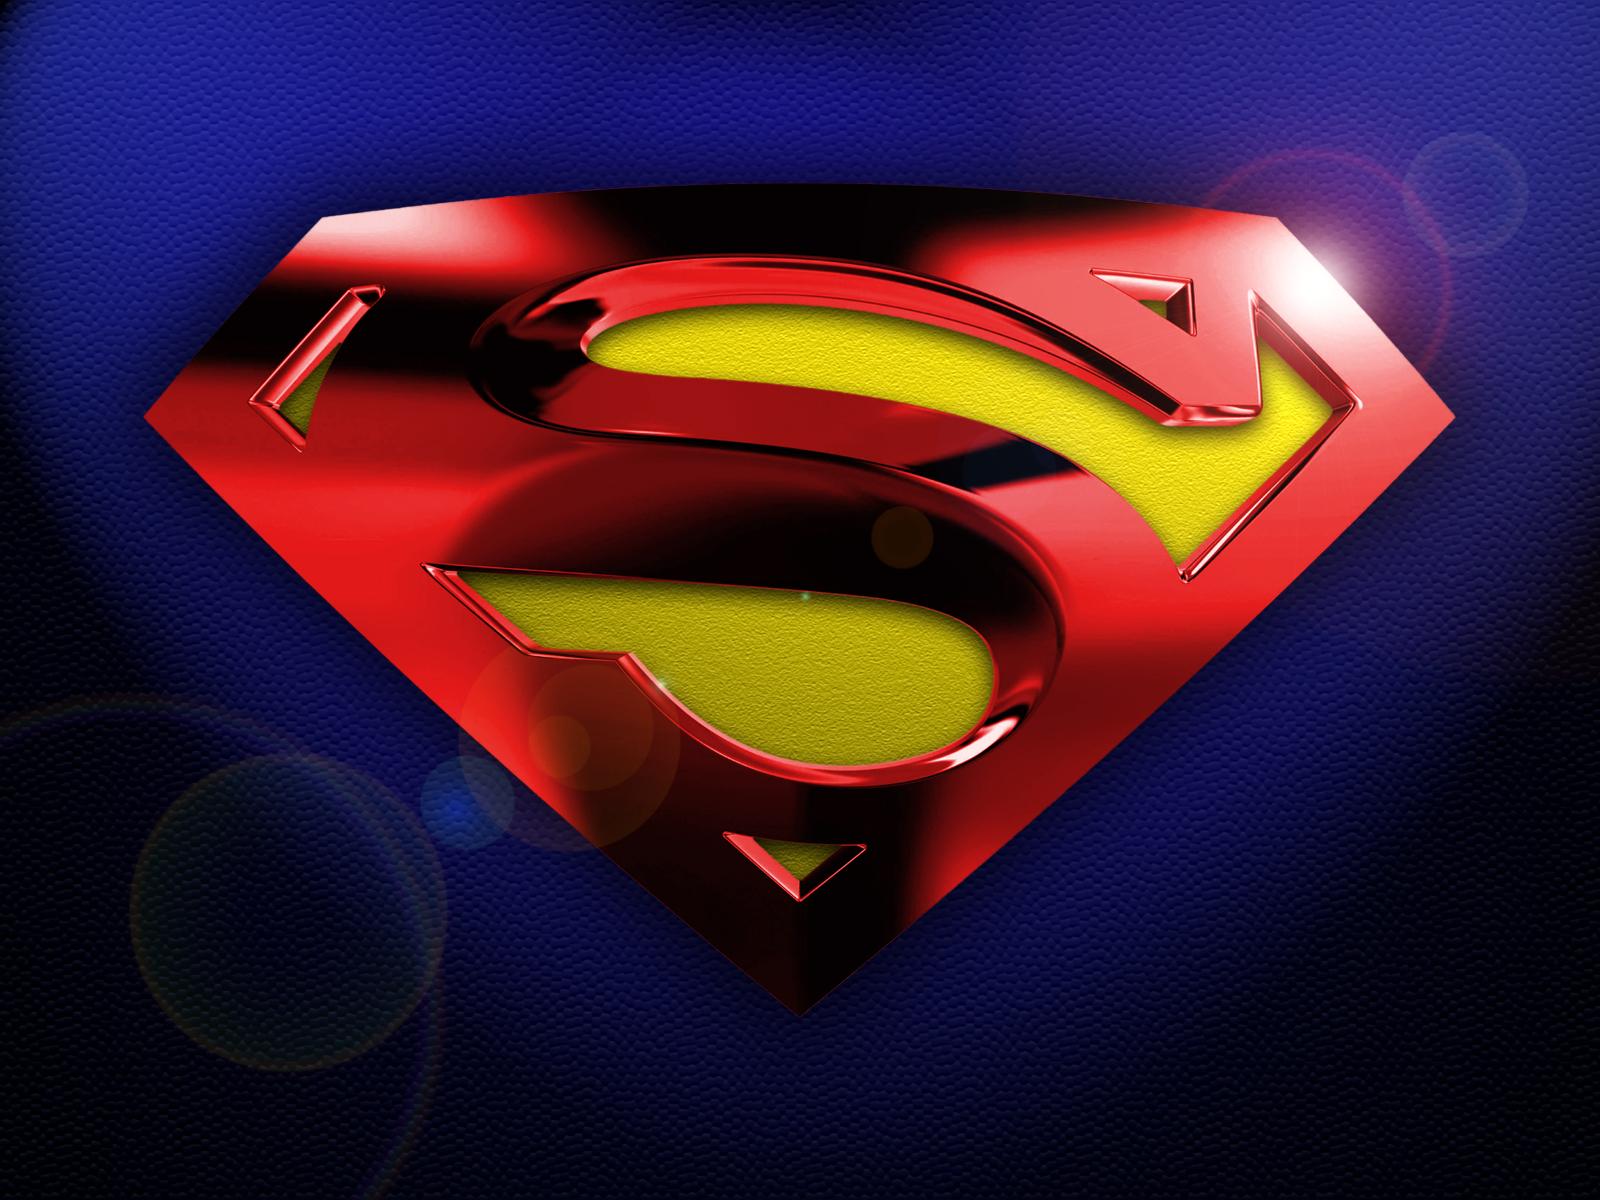 http://3.bp.blogspot.com/-aKCGQNiiHvg/Tmp6XxmcW8I/AAAAAAAAEY8/kuQxO3toZsQ/s1600/superman+wallpaper+hd+2.jpg